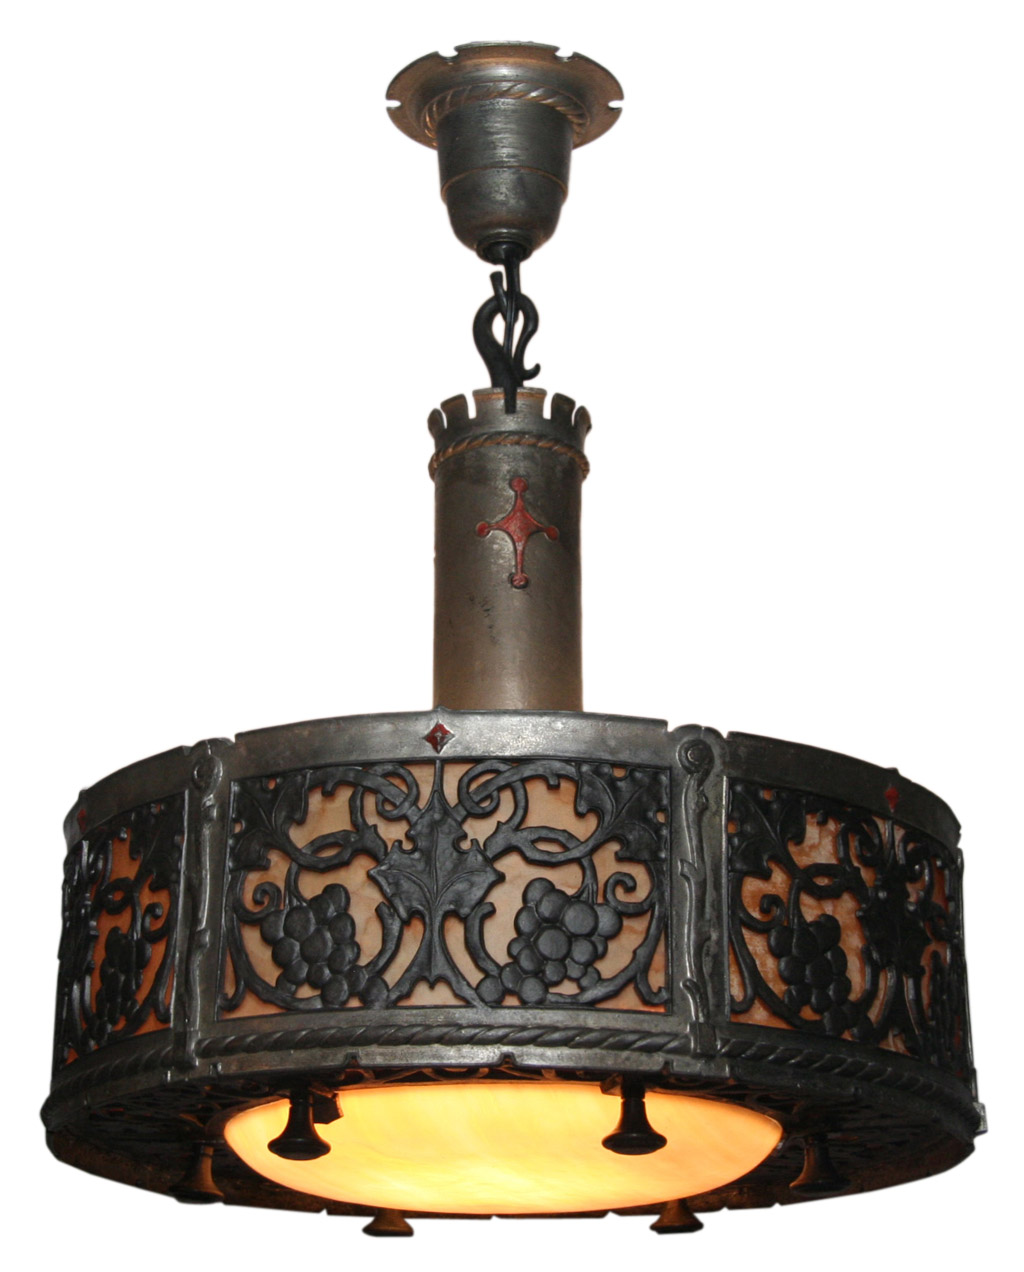 Antique arts and crafts lighting fixture antique vintage antique arts and crafts lighting fixture antique vintage lighting at victorian revival arubaitofo Choice Image